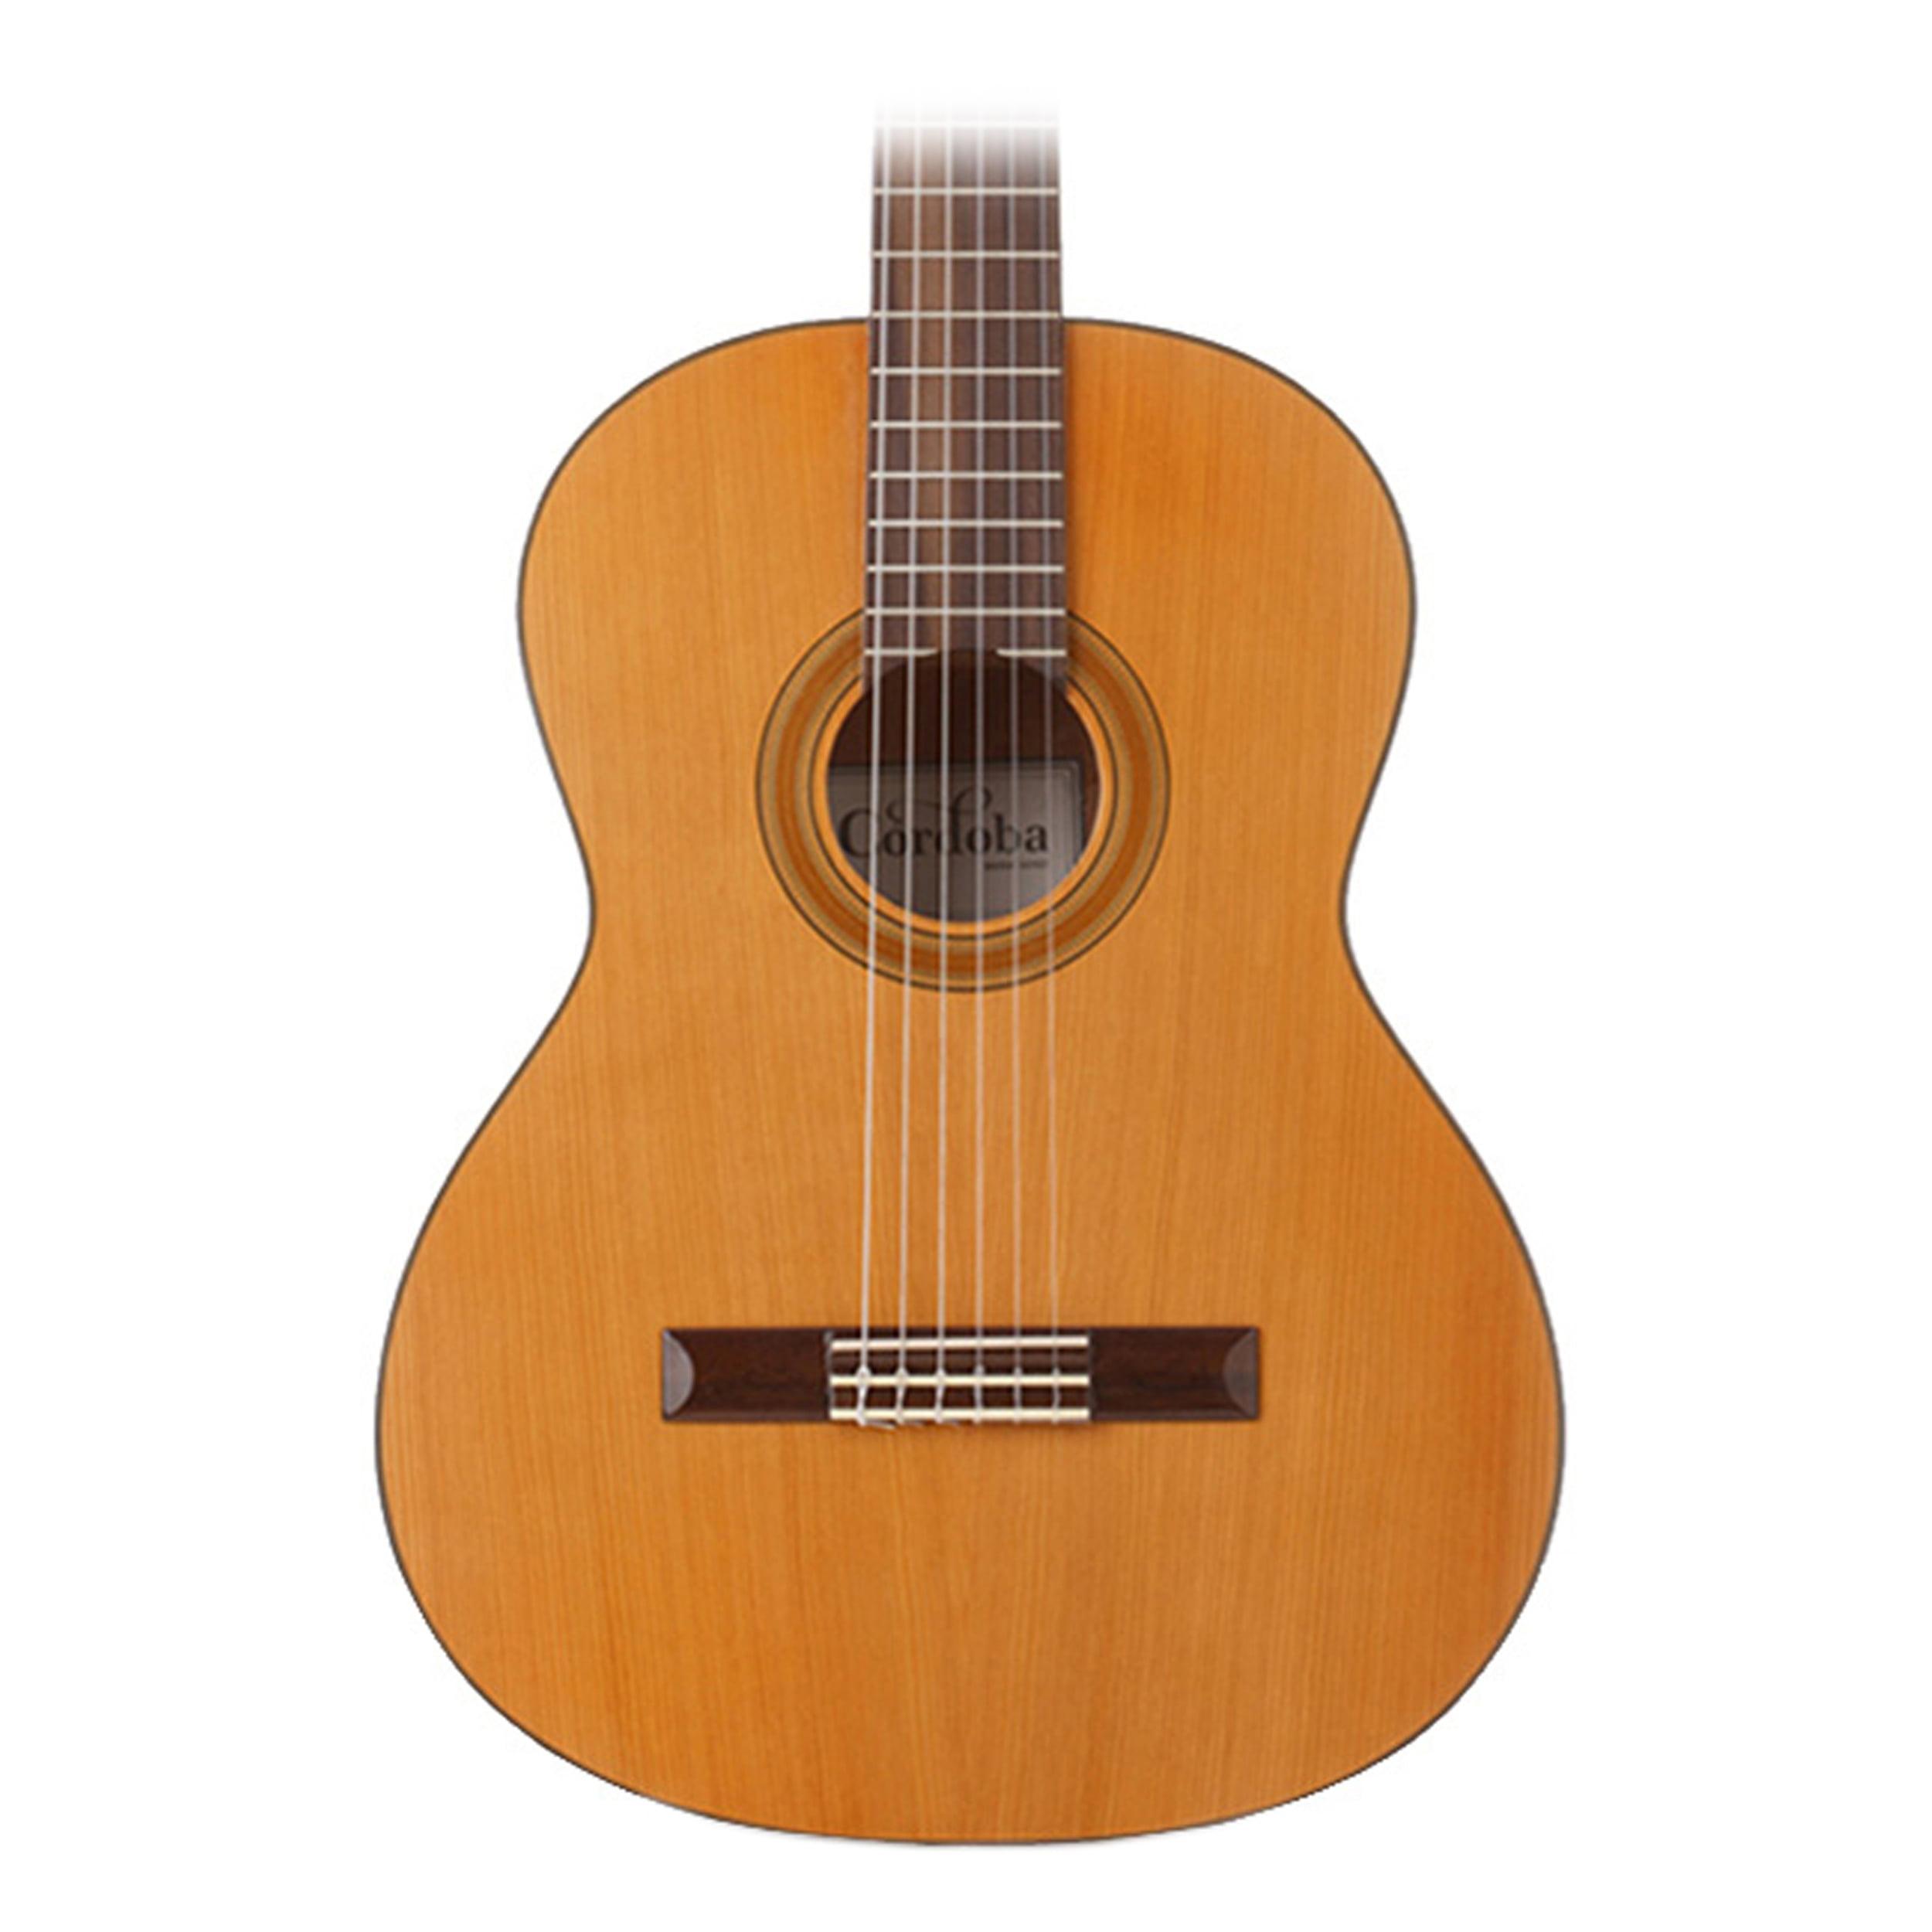 Cordoba C3m Classical Acoustic Guitar in Natural Matte Finish